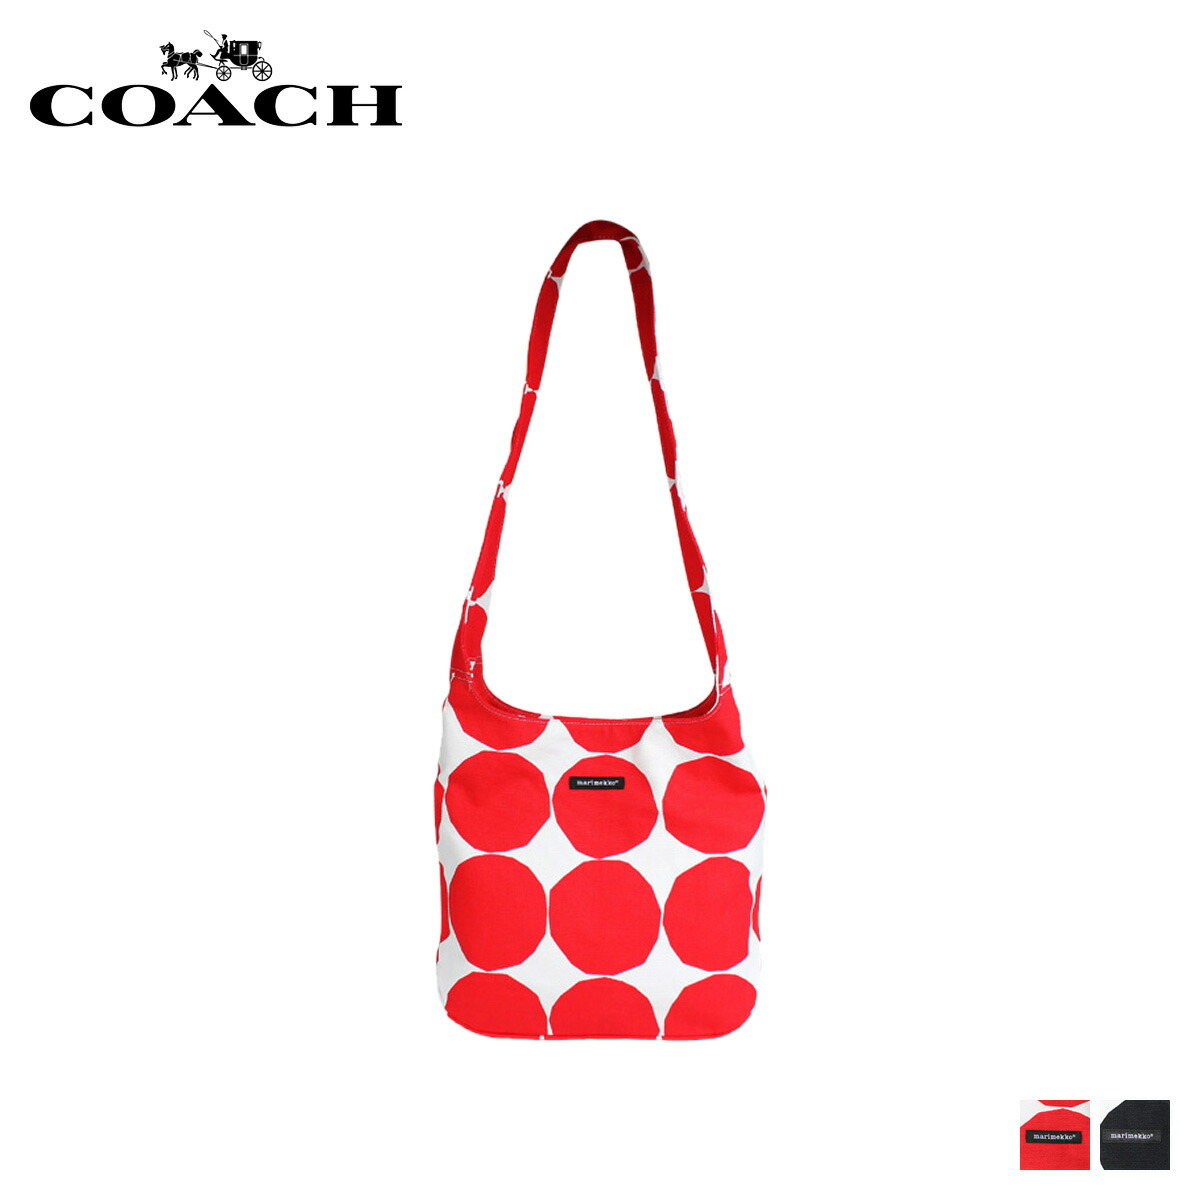 be398377eabe ALLSPORTS  Marimekko marimekko bags shoulder bag polka dot 026907 2 ...